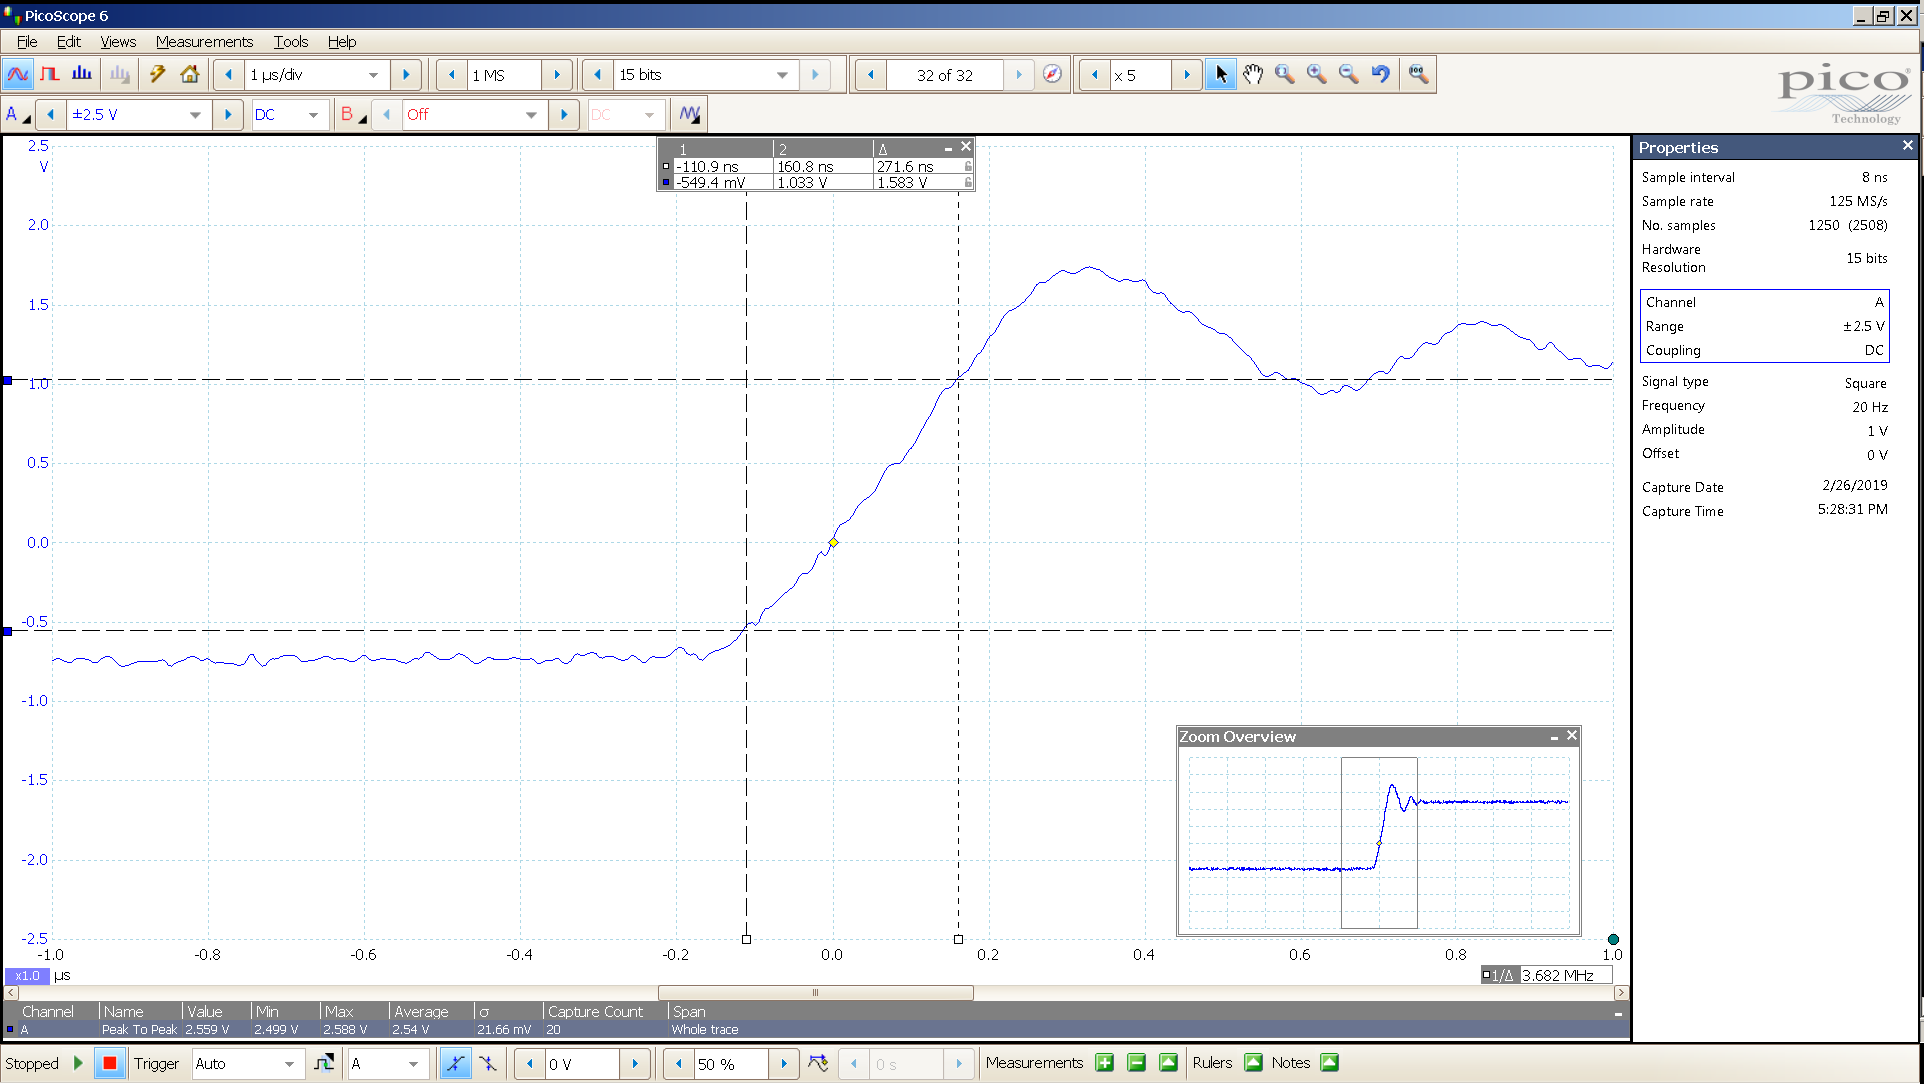 20190221 SigGen P20 20 Hz square 2000mVpp 1uS div 5MHz filter 300R - BW calc.png